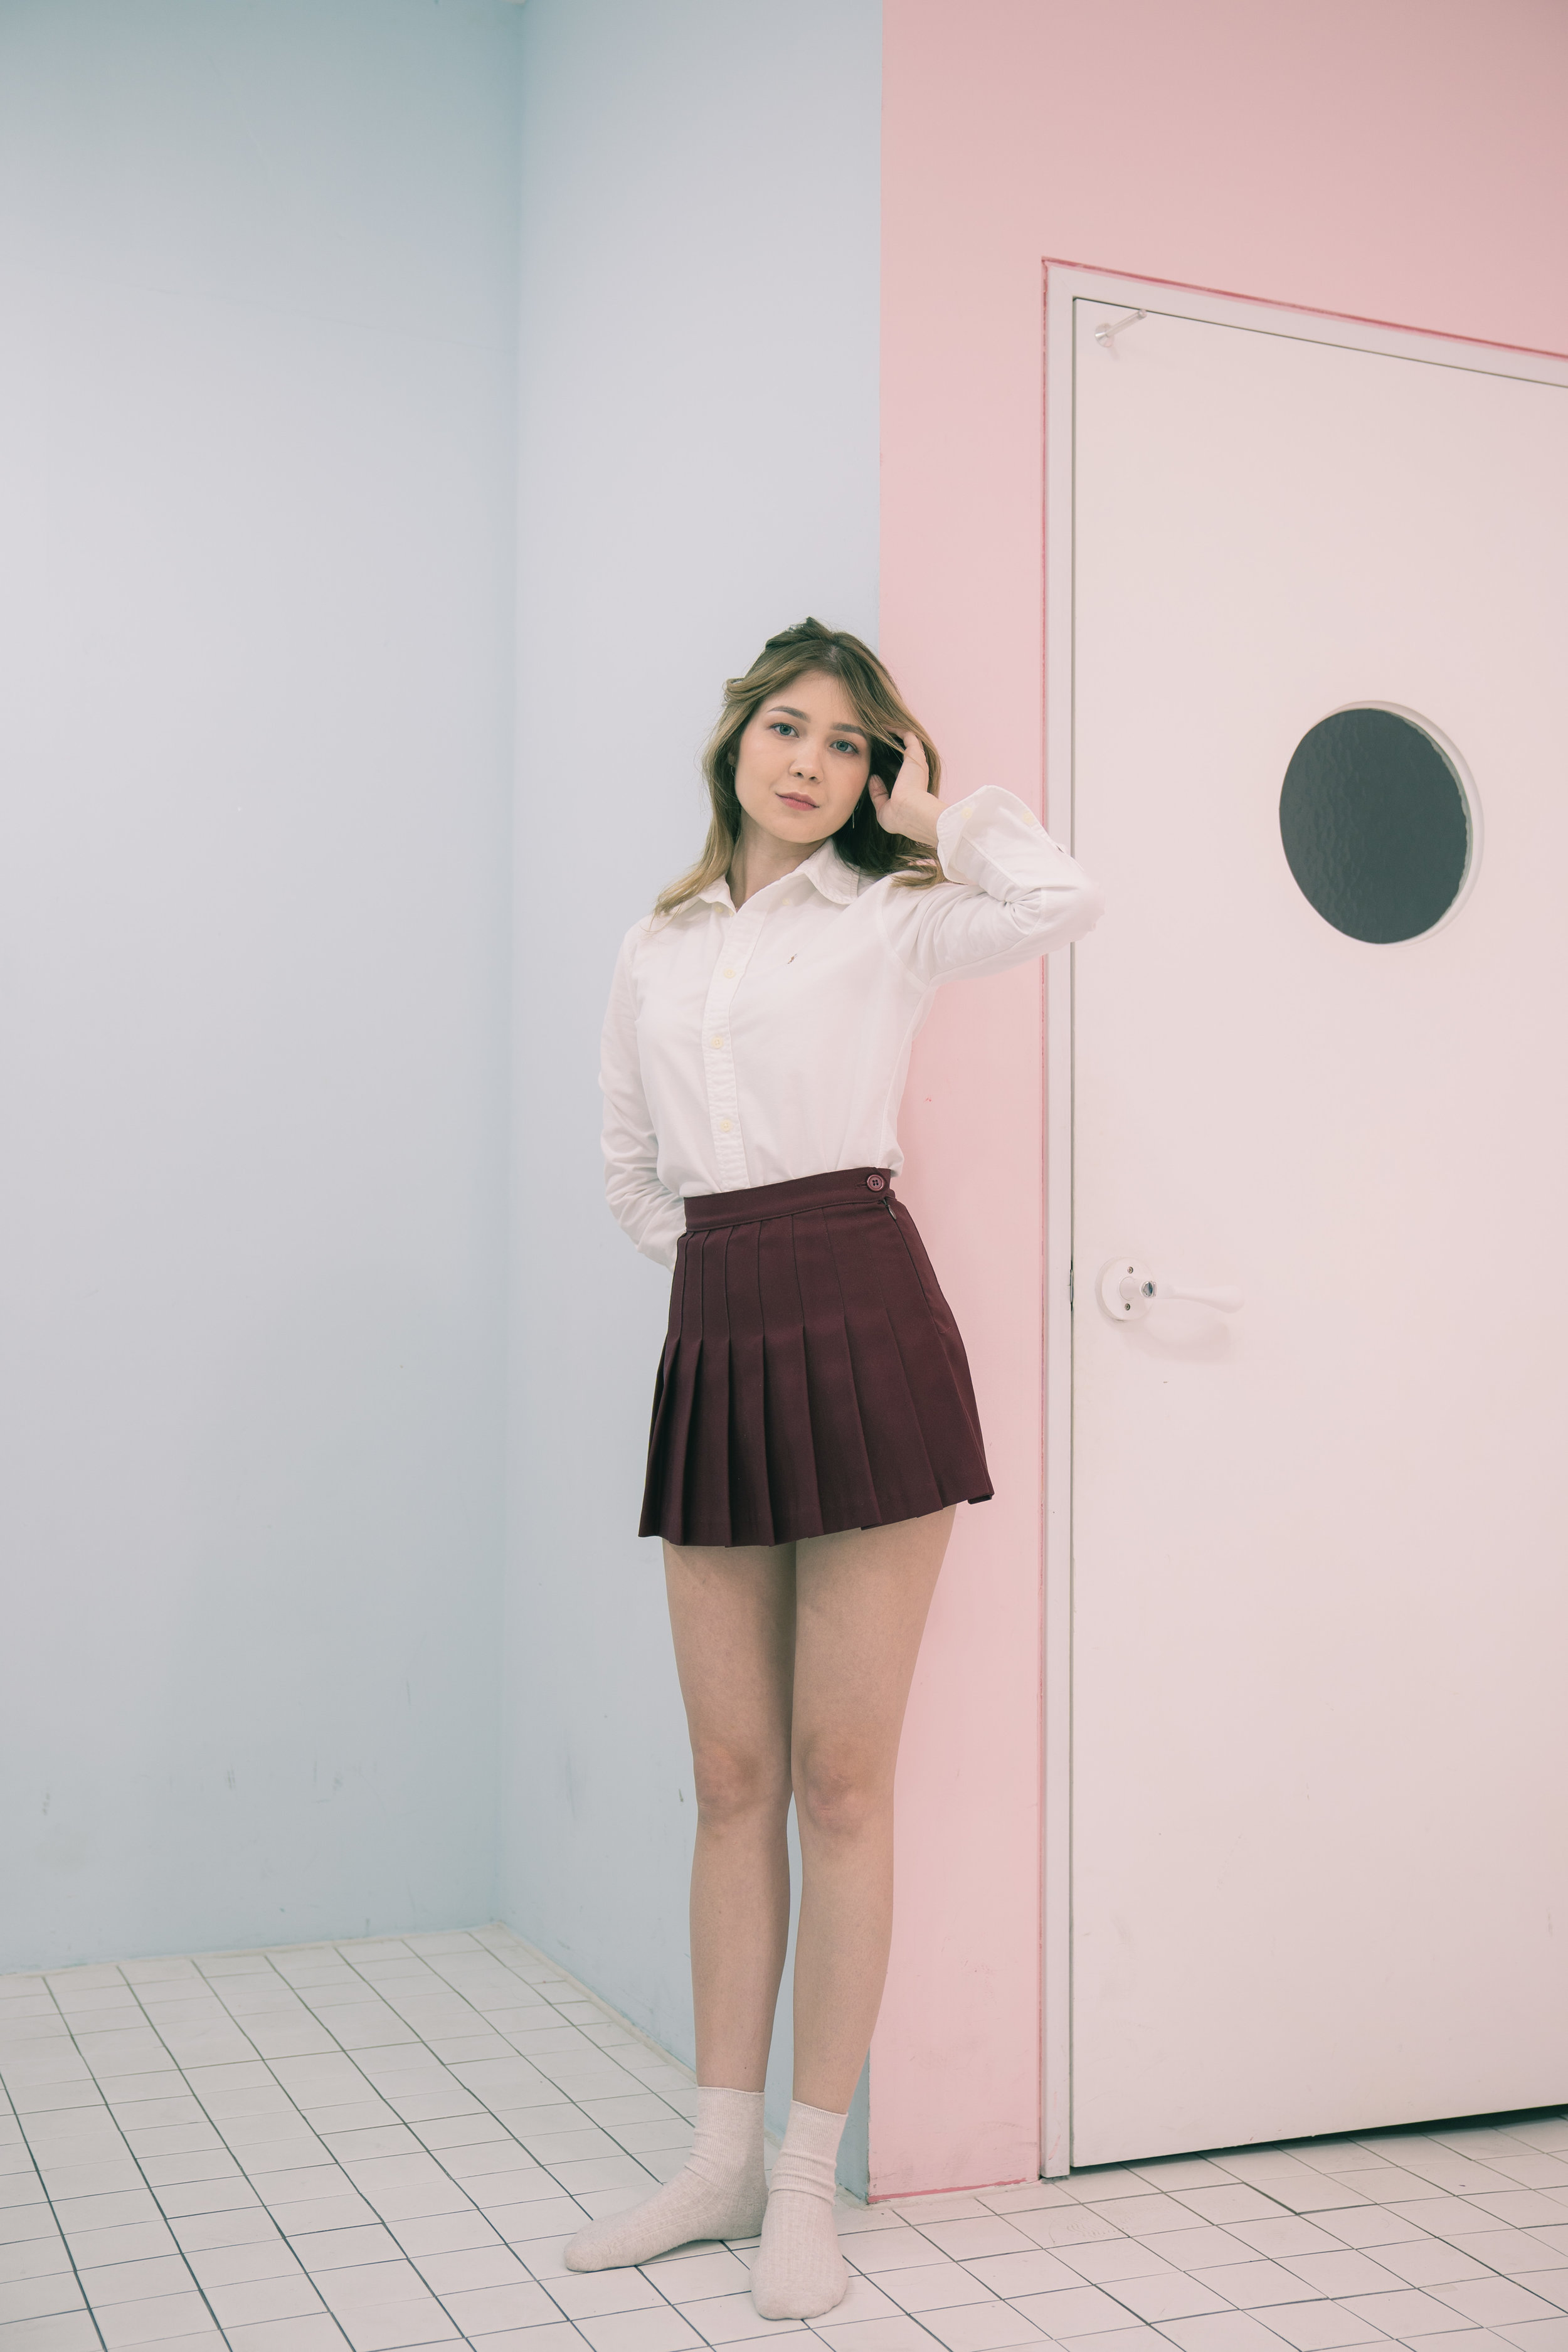 Sprazzi_Professional_Photography_Photographer_Seoul_Korea_Sion_Original_33.jpg